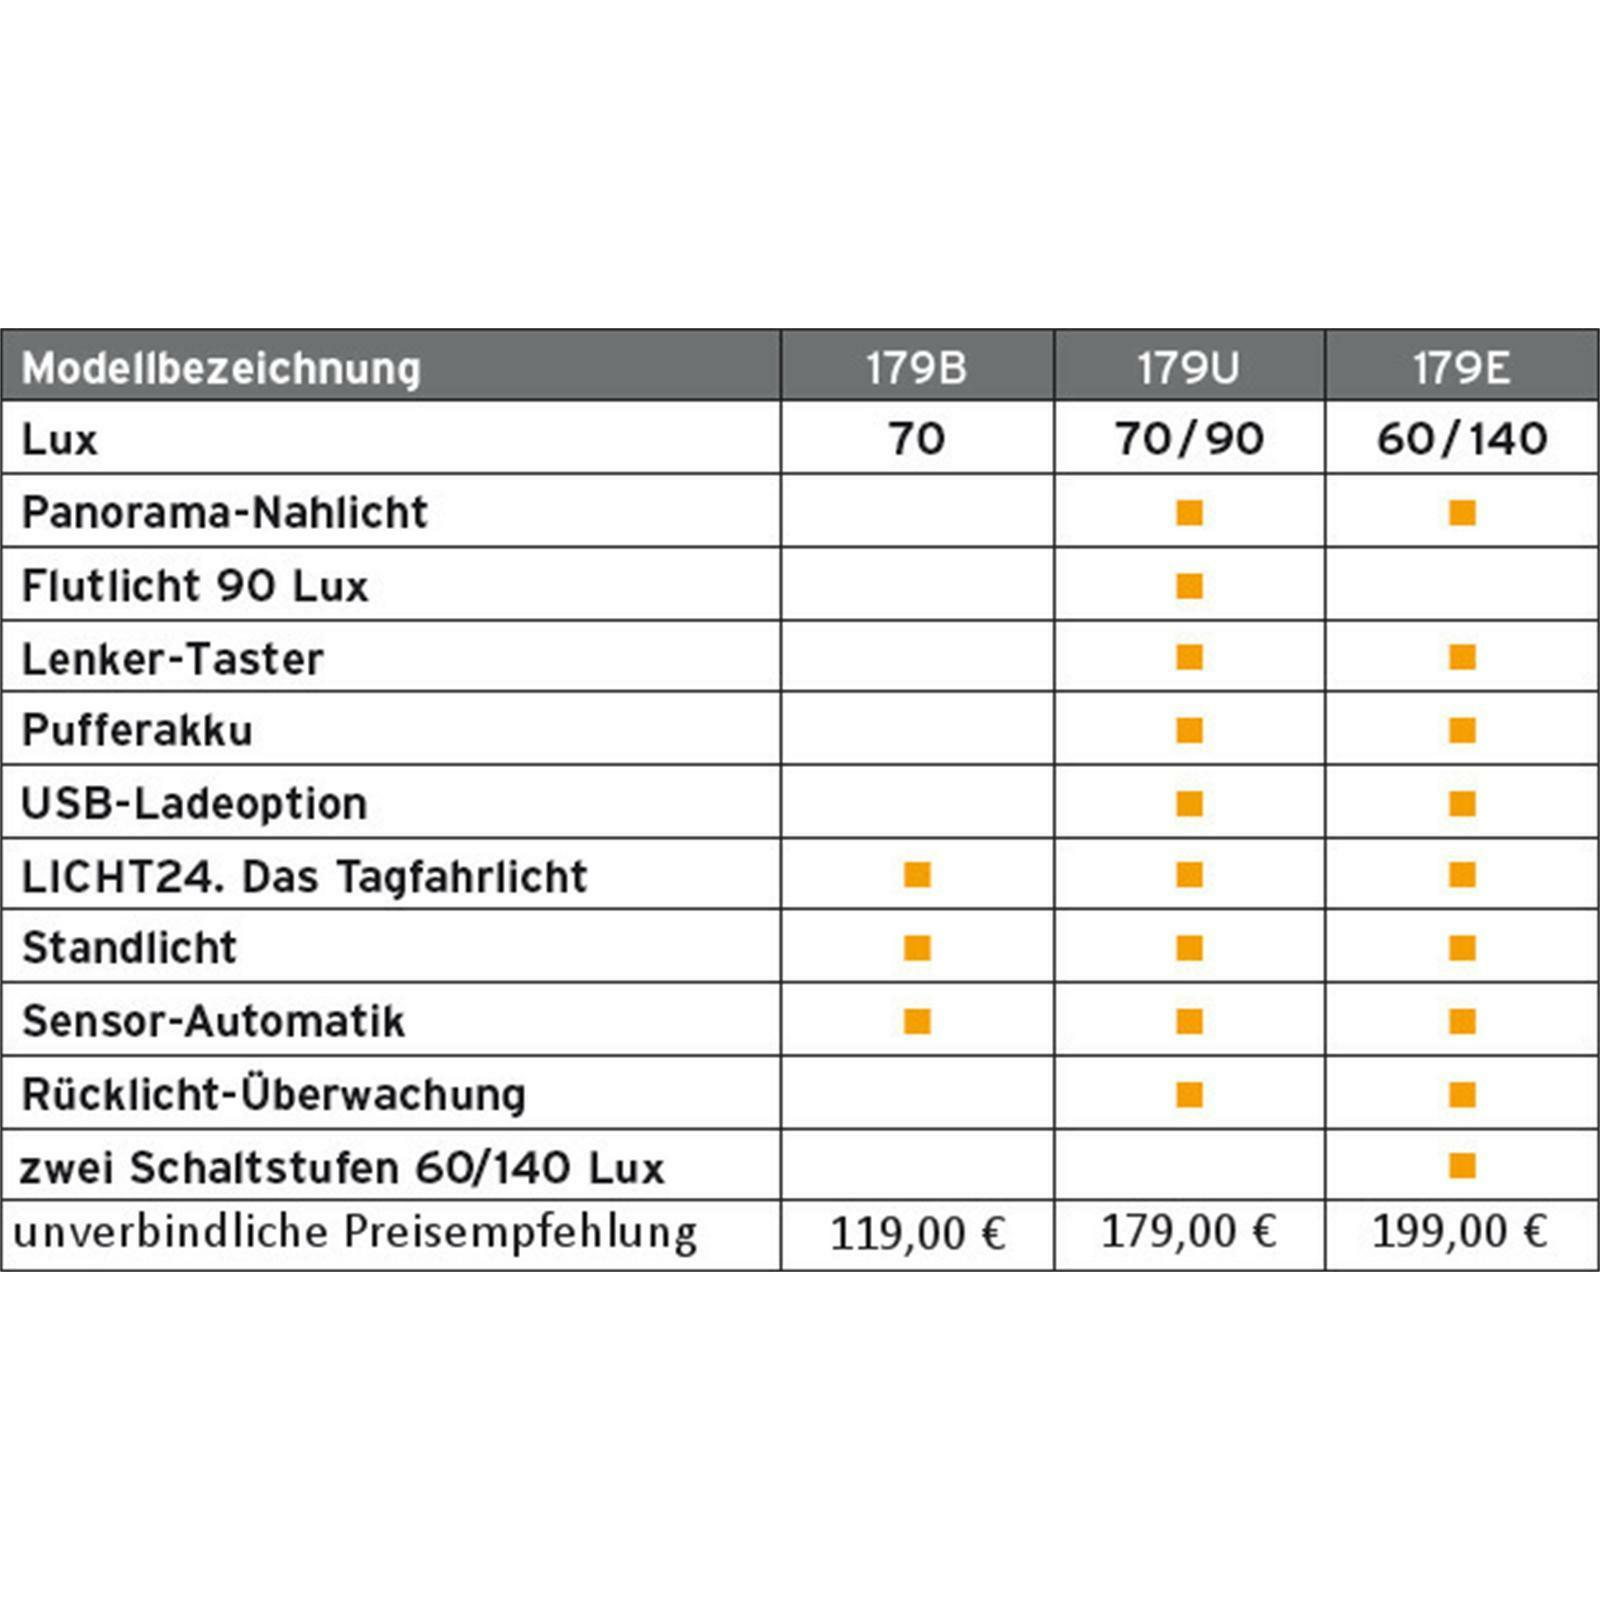 Busch & - Müller LUMOTEC IQ2 LUXOS B - & 179B Dynamo Fahrrad Licht Lampe 70 Lux 761808